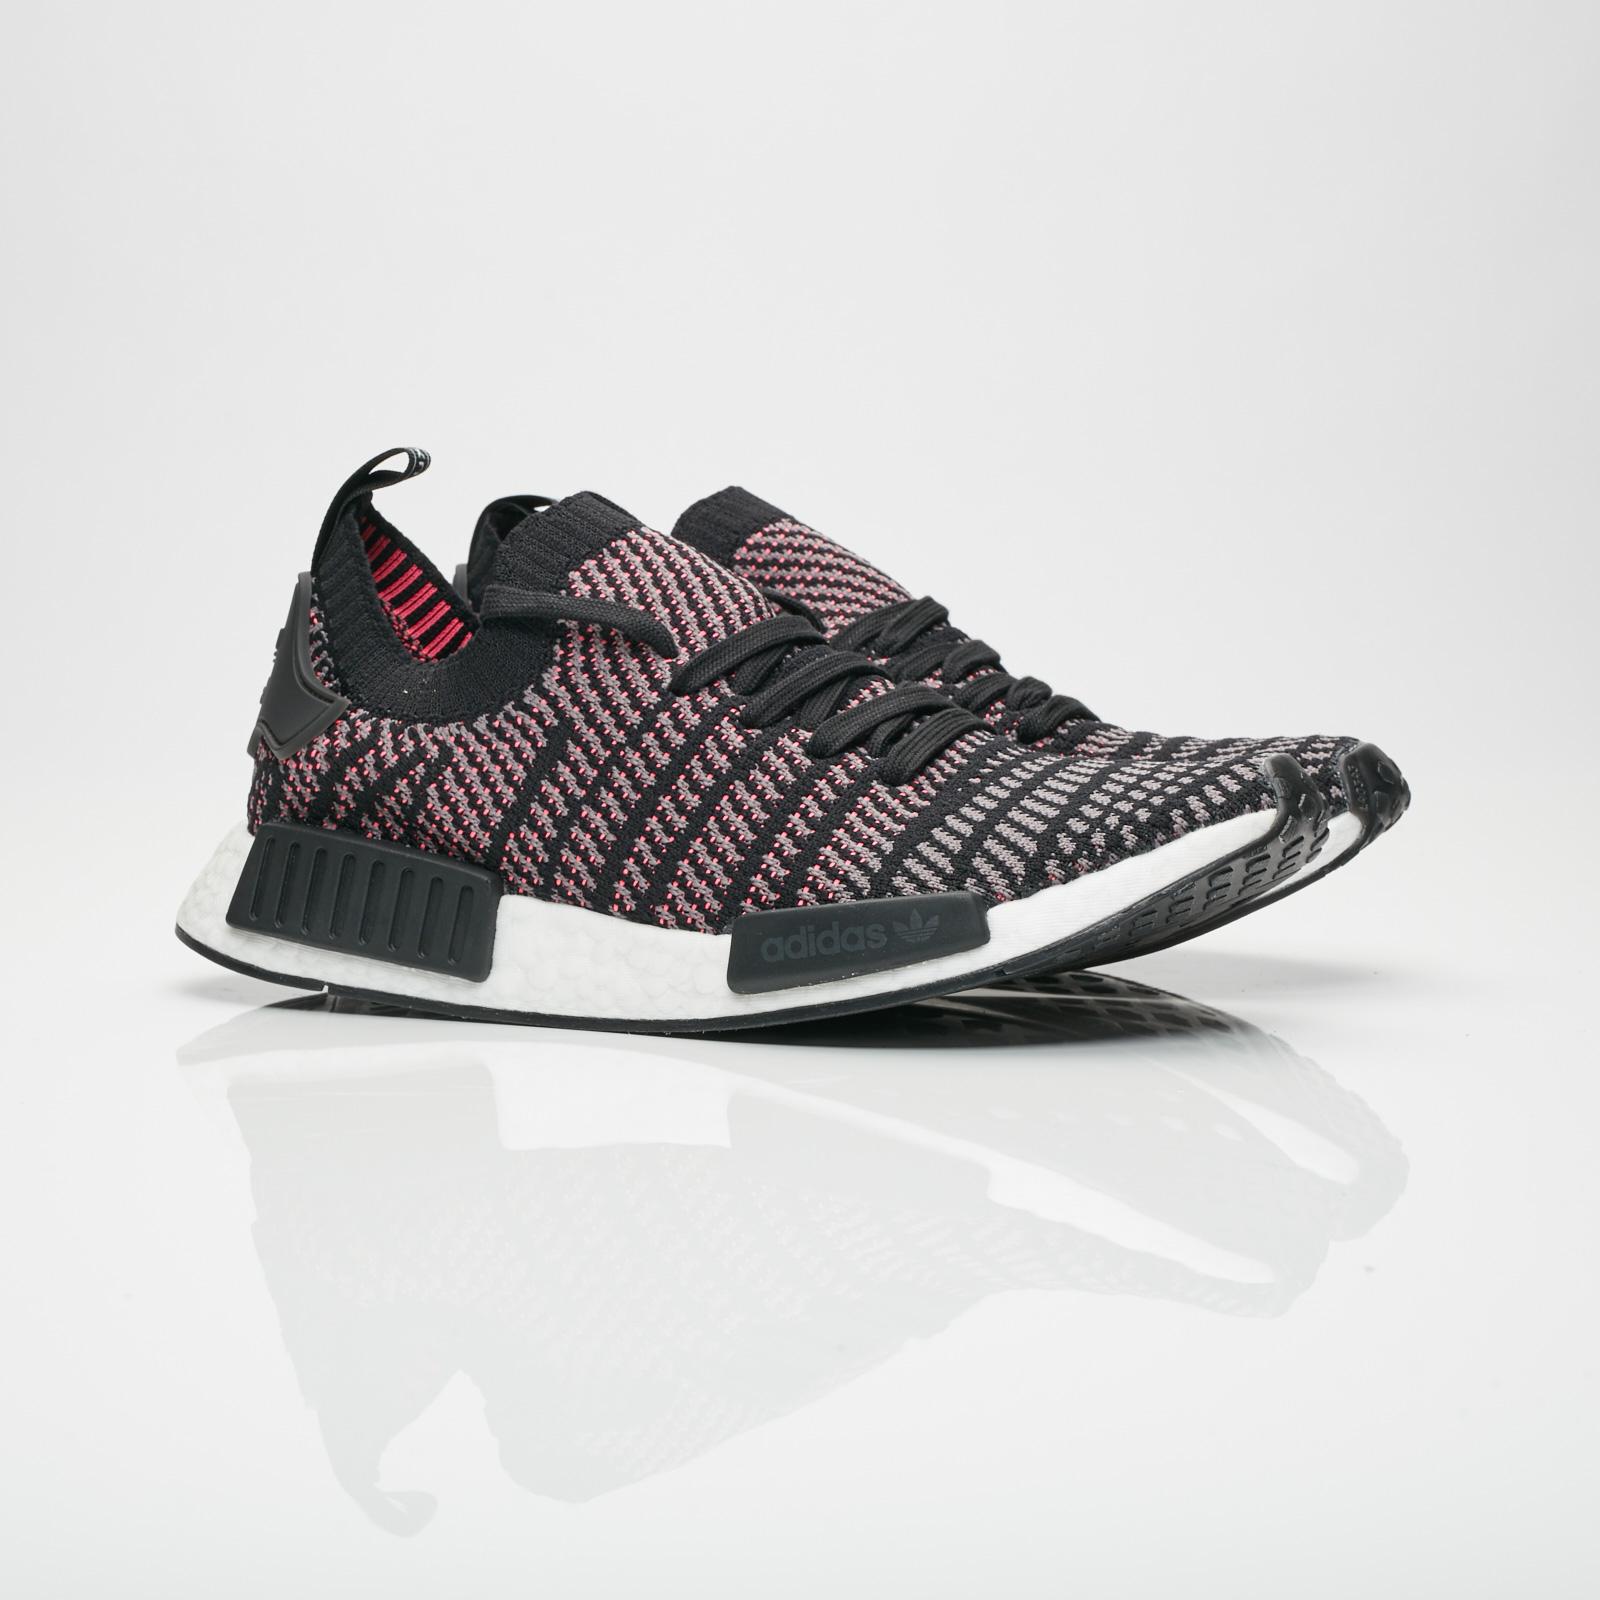 adidas NMD R1 STLT Primeknit - Cq2386 - SNS | sneakers ...